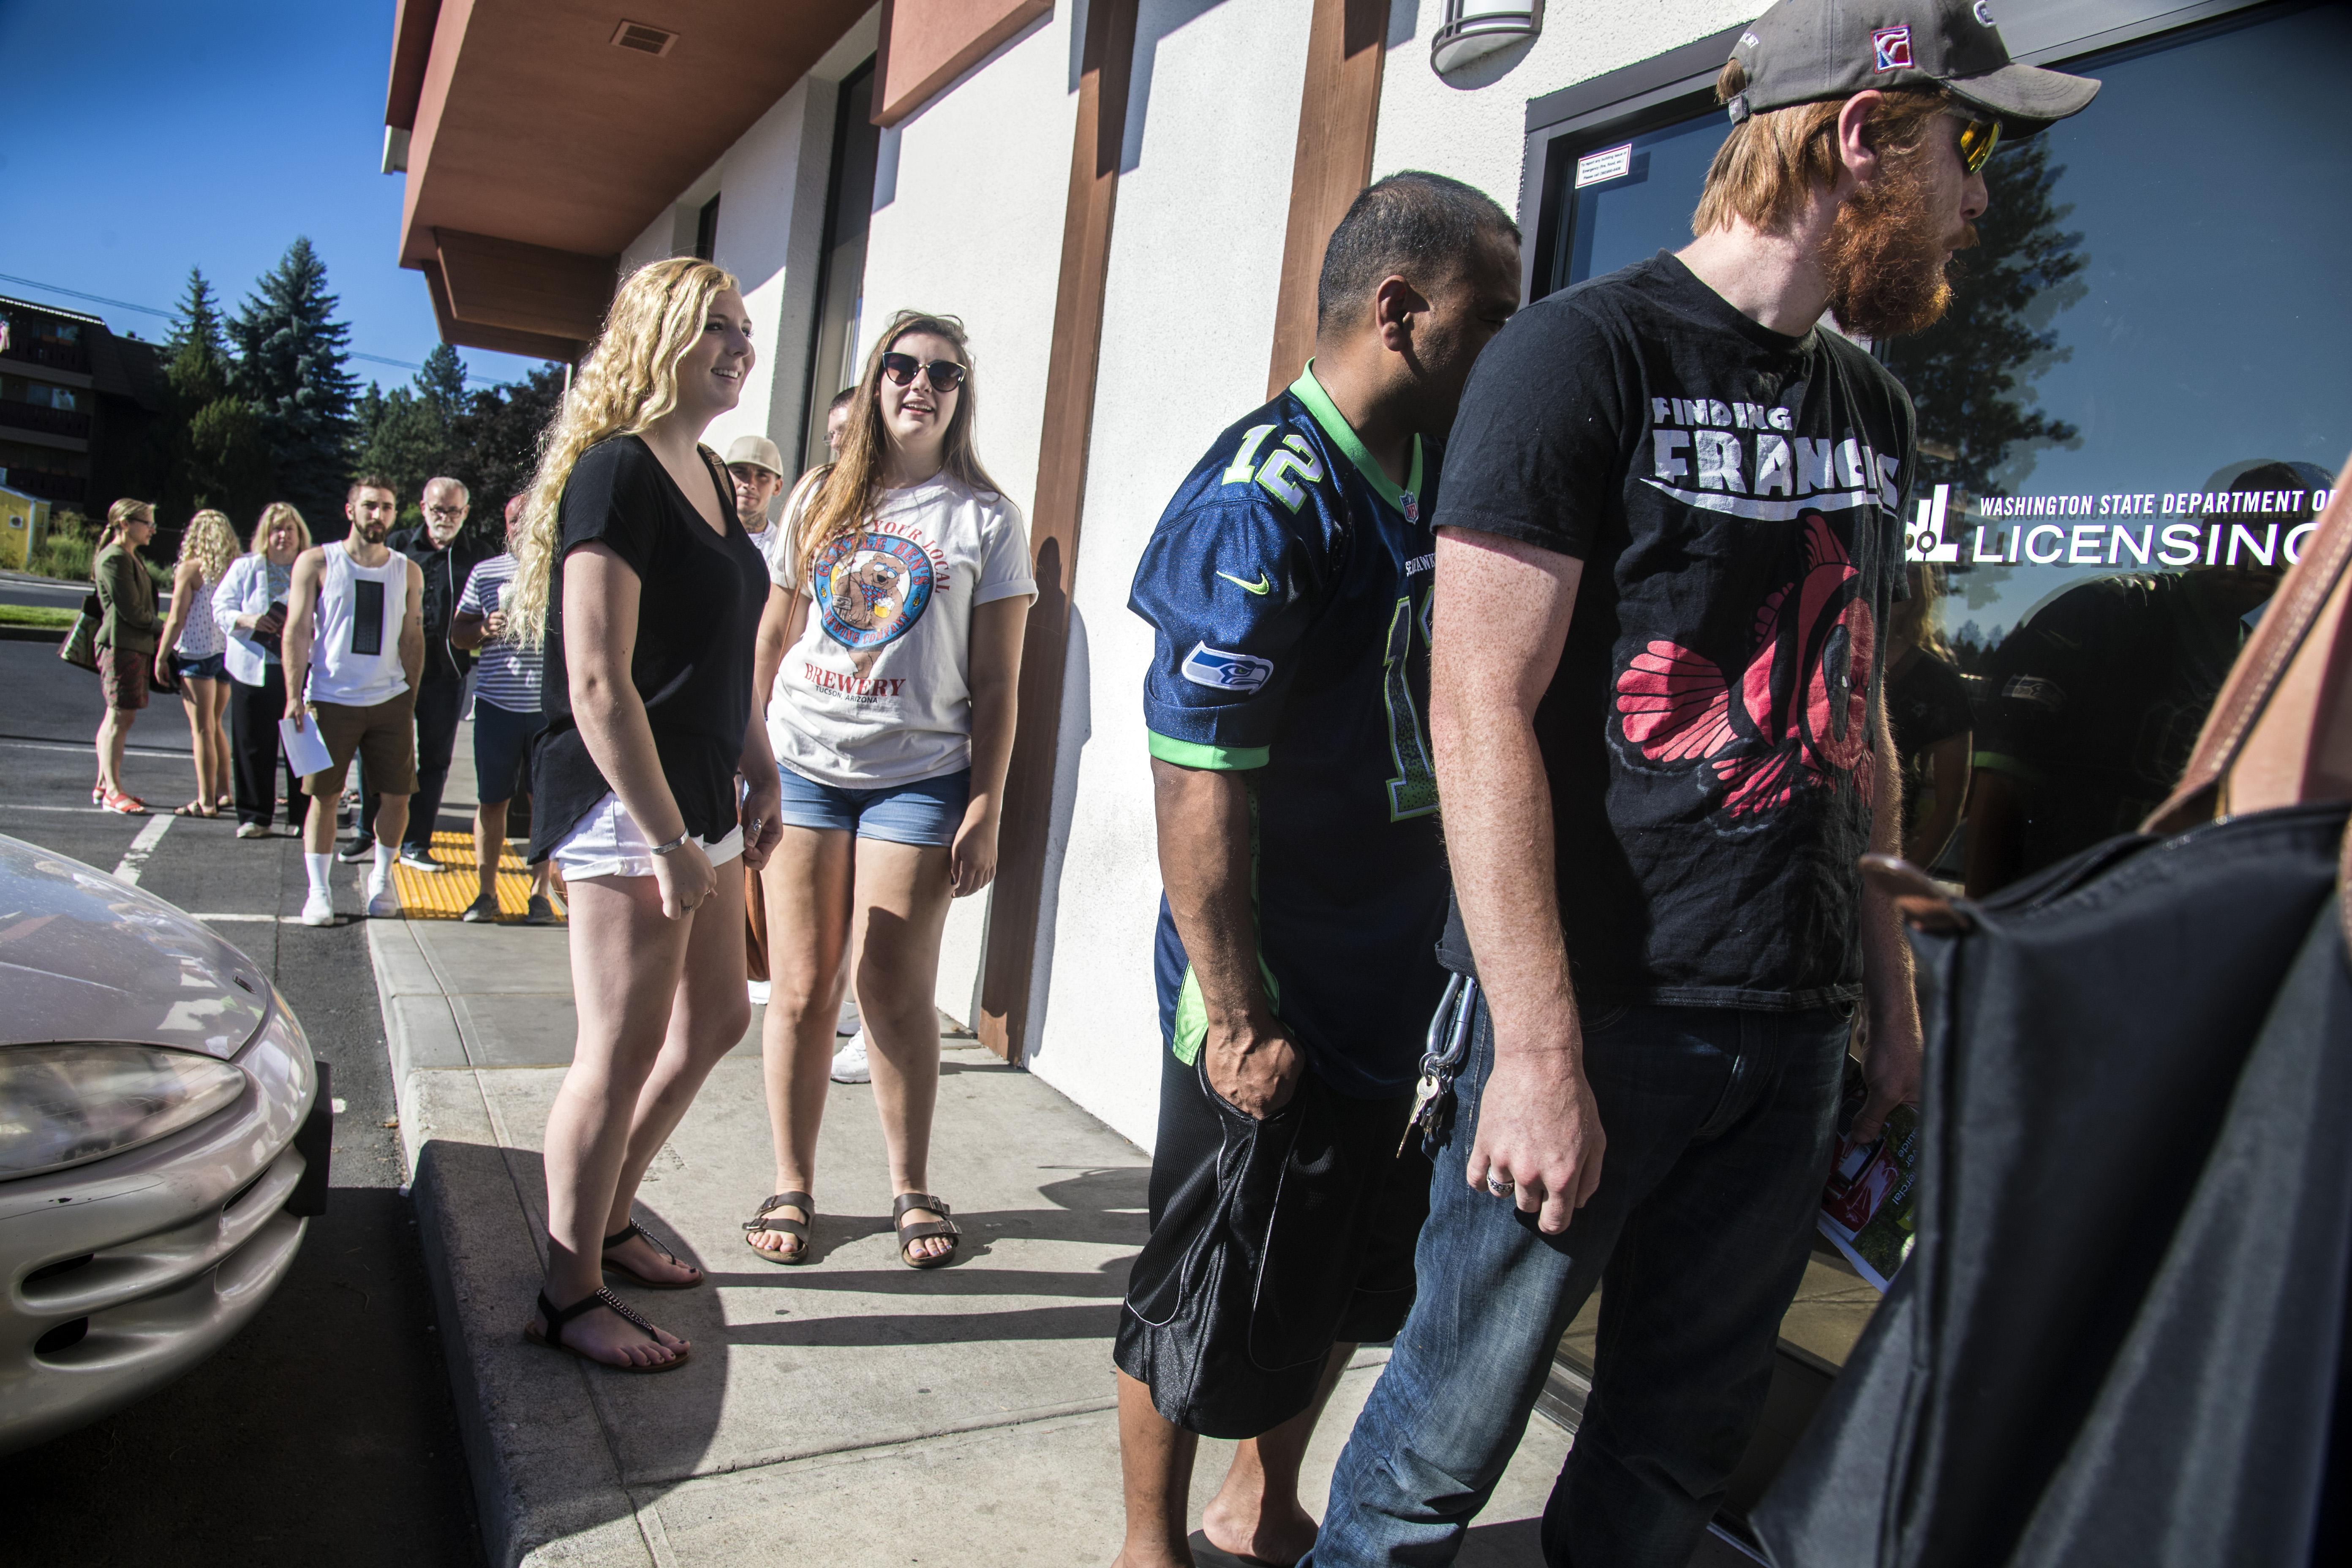 Spokane residents face longer waiting times at driver licensing spokane residents face longer waiting times at driver licensing office the spokesman review xflitez Choice Image